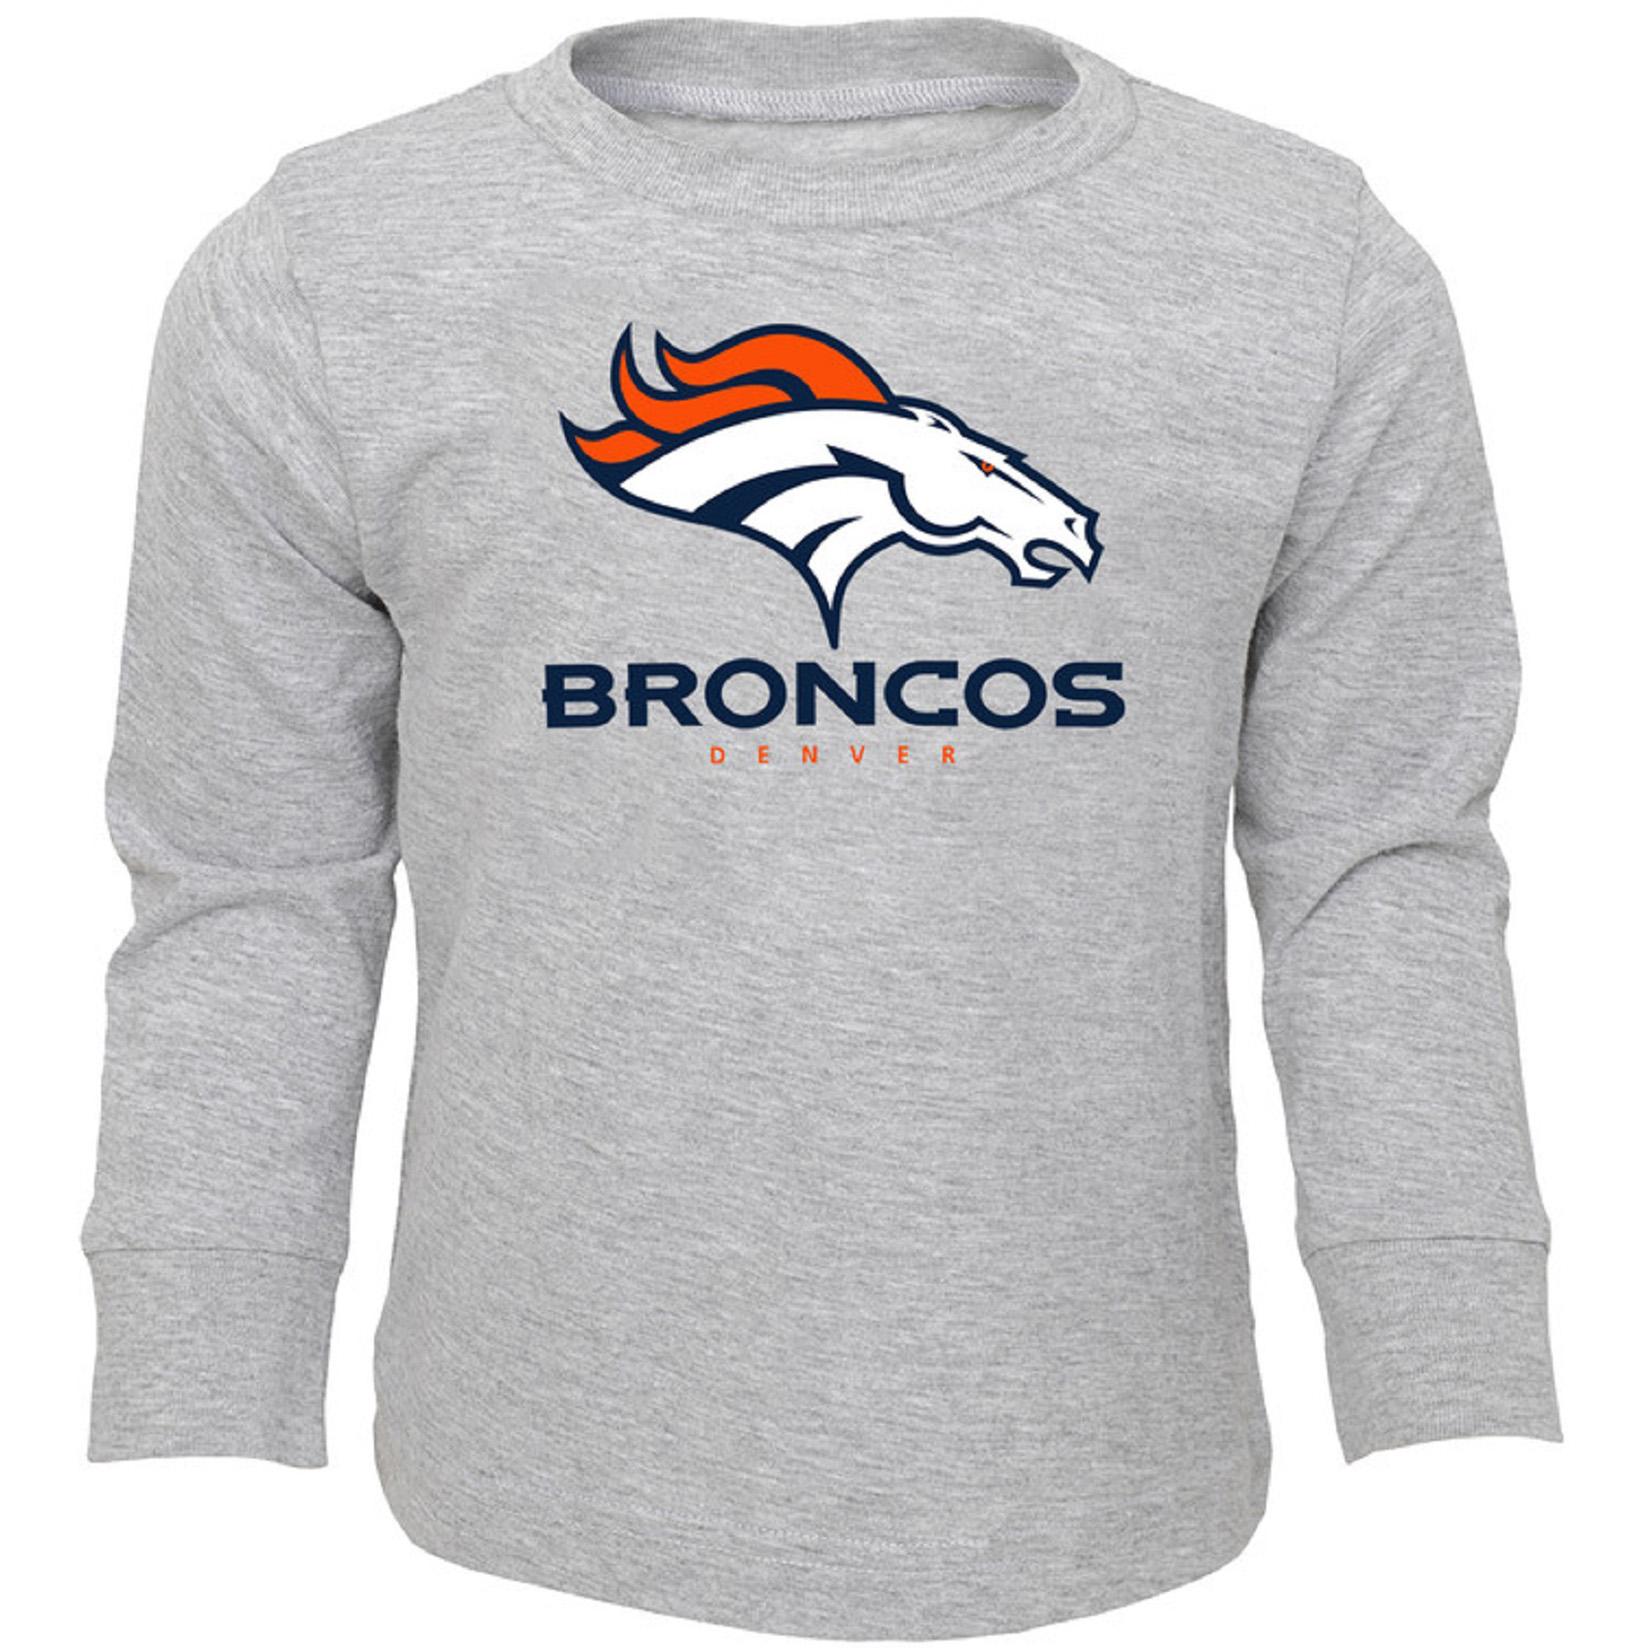 Toddler Heathered Gray Denver Broncos Team Long Sleeve T-Shirt